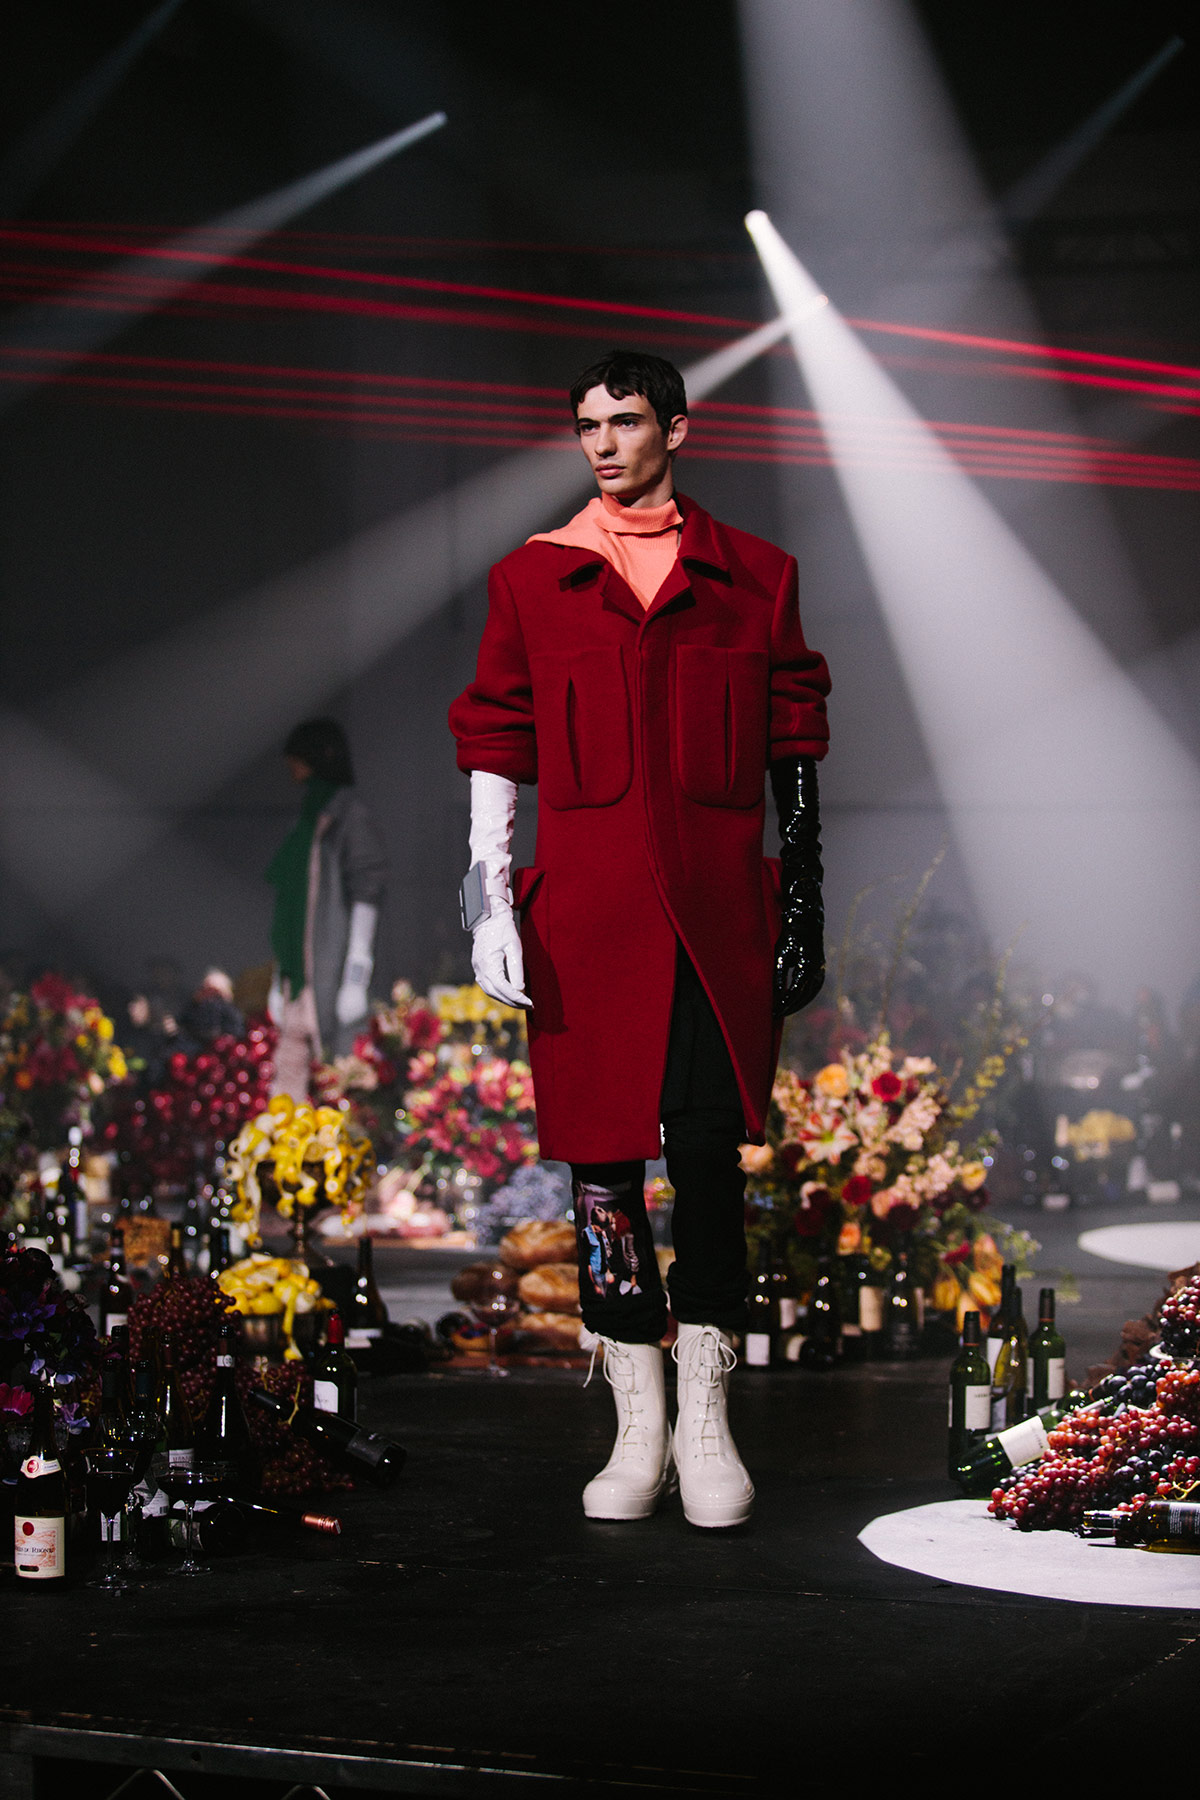 Simon chang fashion designer 83